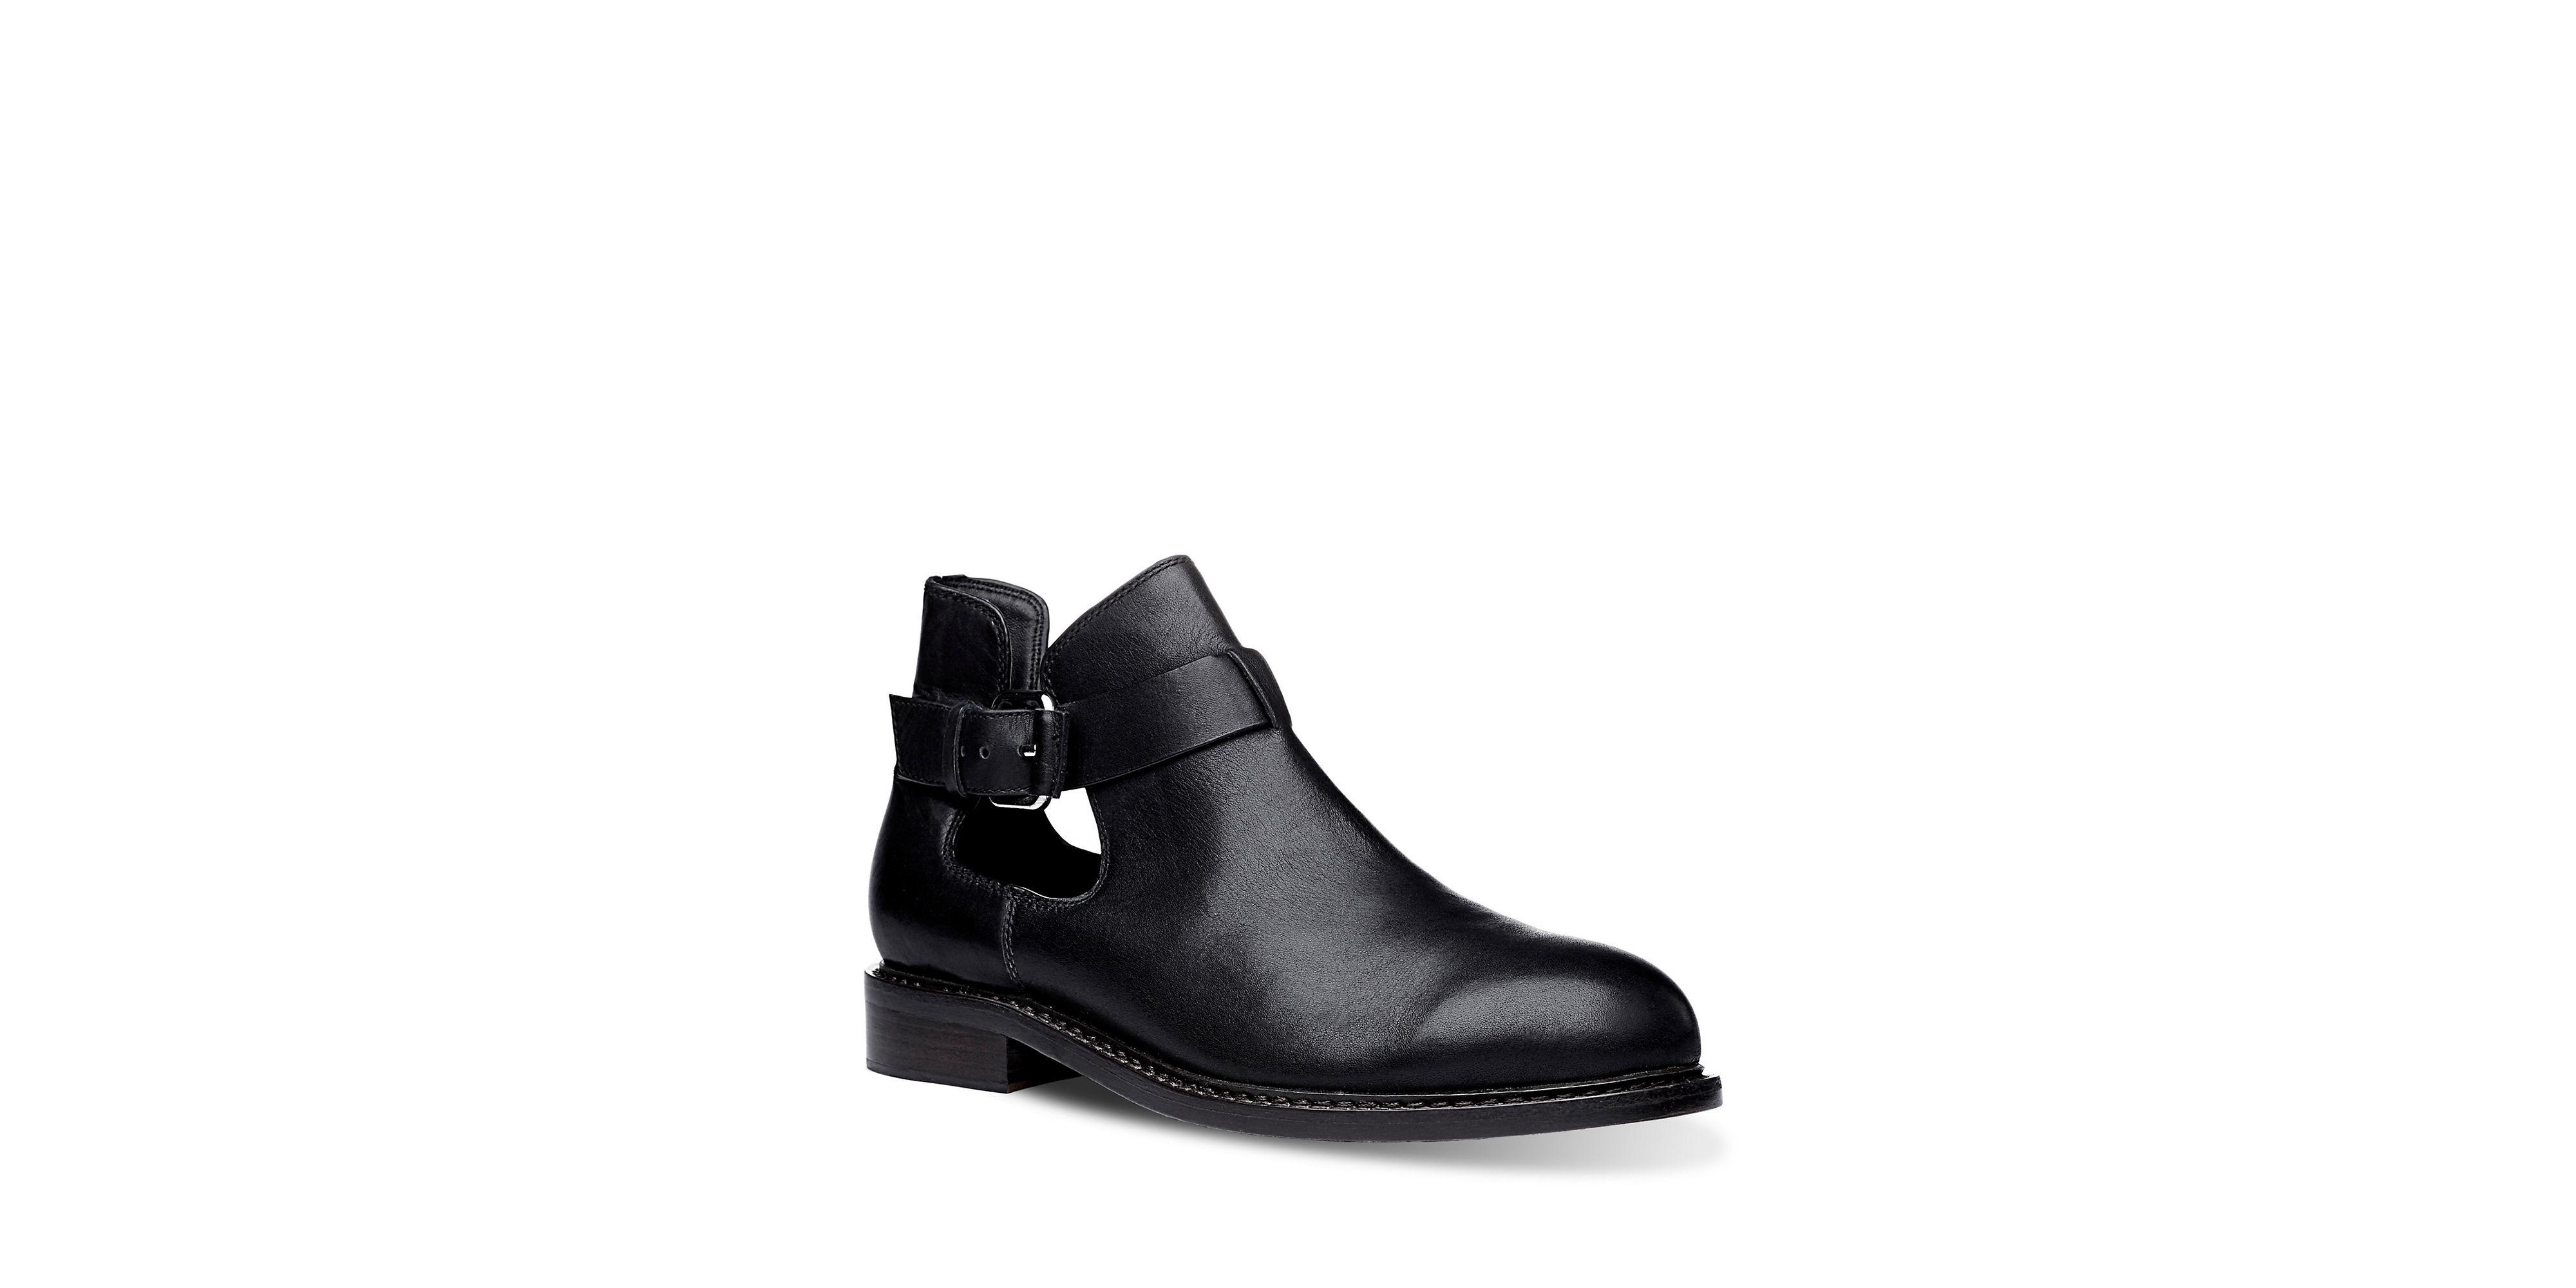 liebeskind leather short booties in black lyst. Black Bedroom Furniture Sets. Home Design Ideas